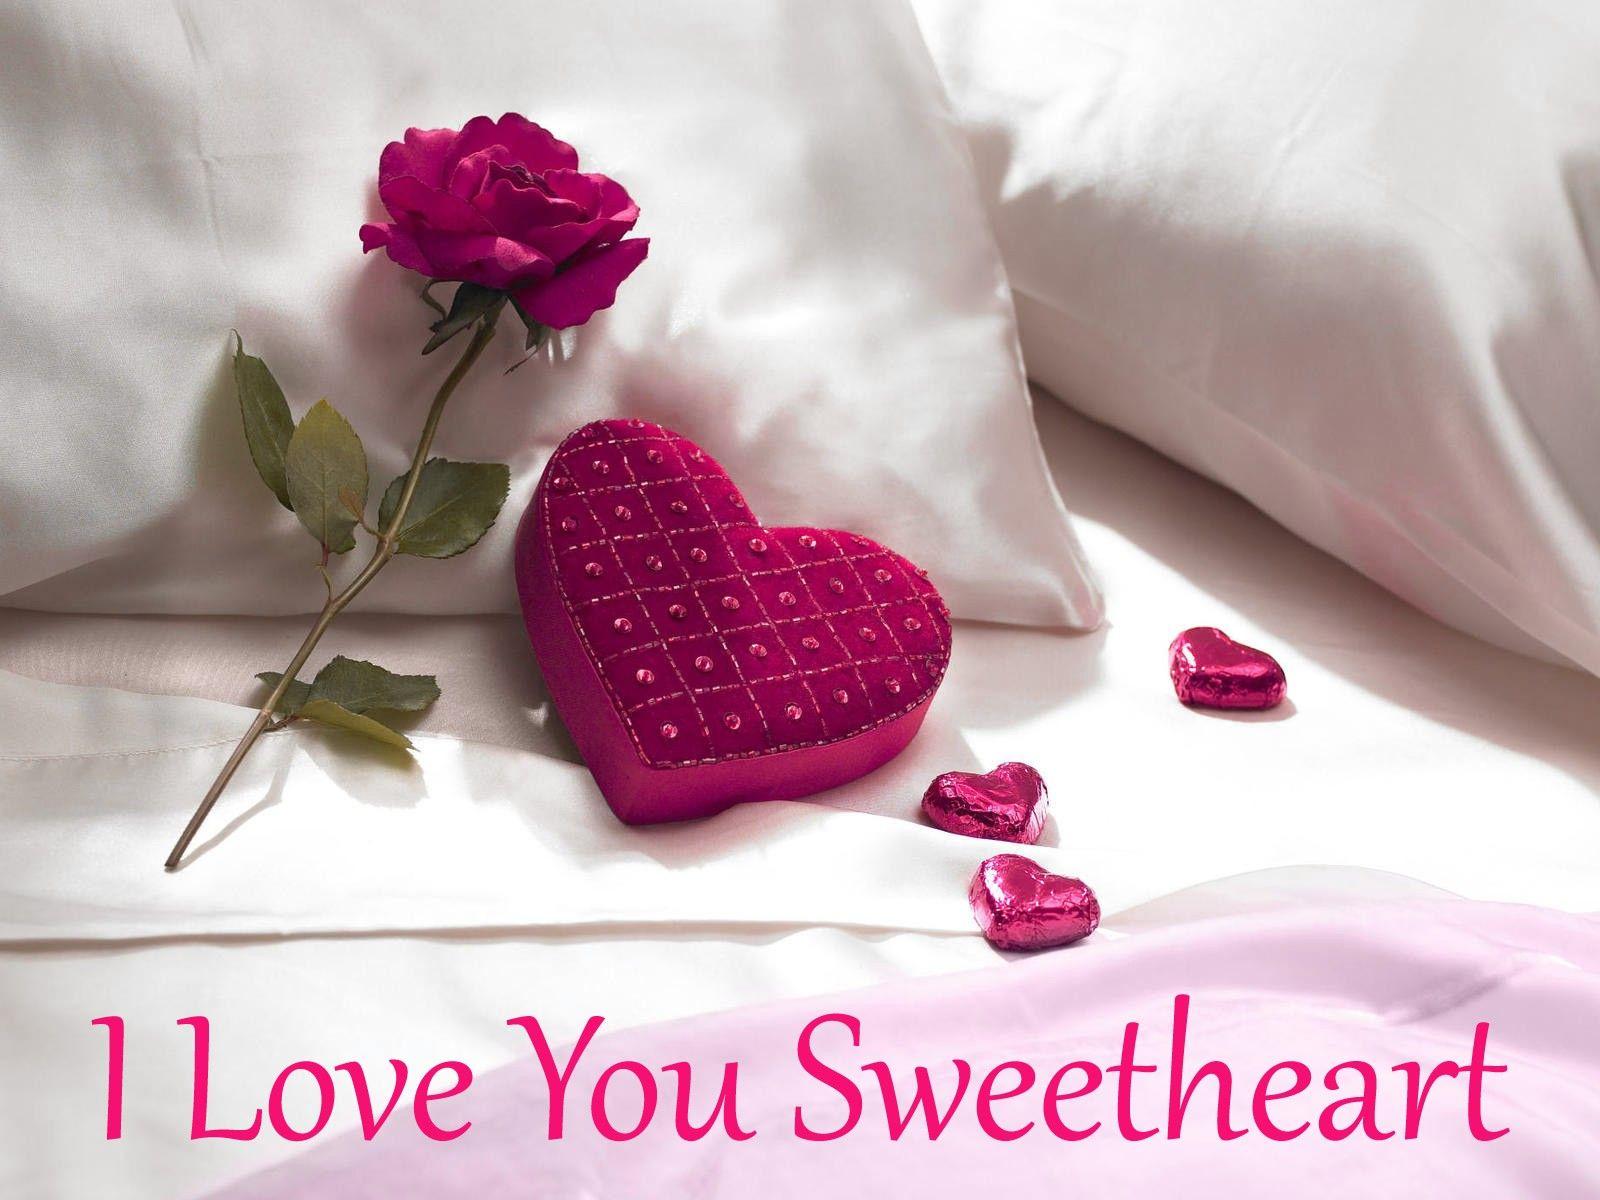 Cute I Love U Wallpapers For Mobile - Love U My Sweet Heart - HD Wallpaper